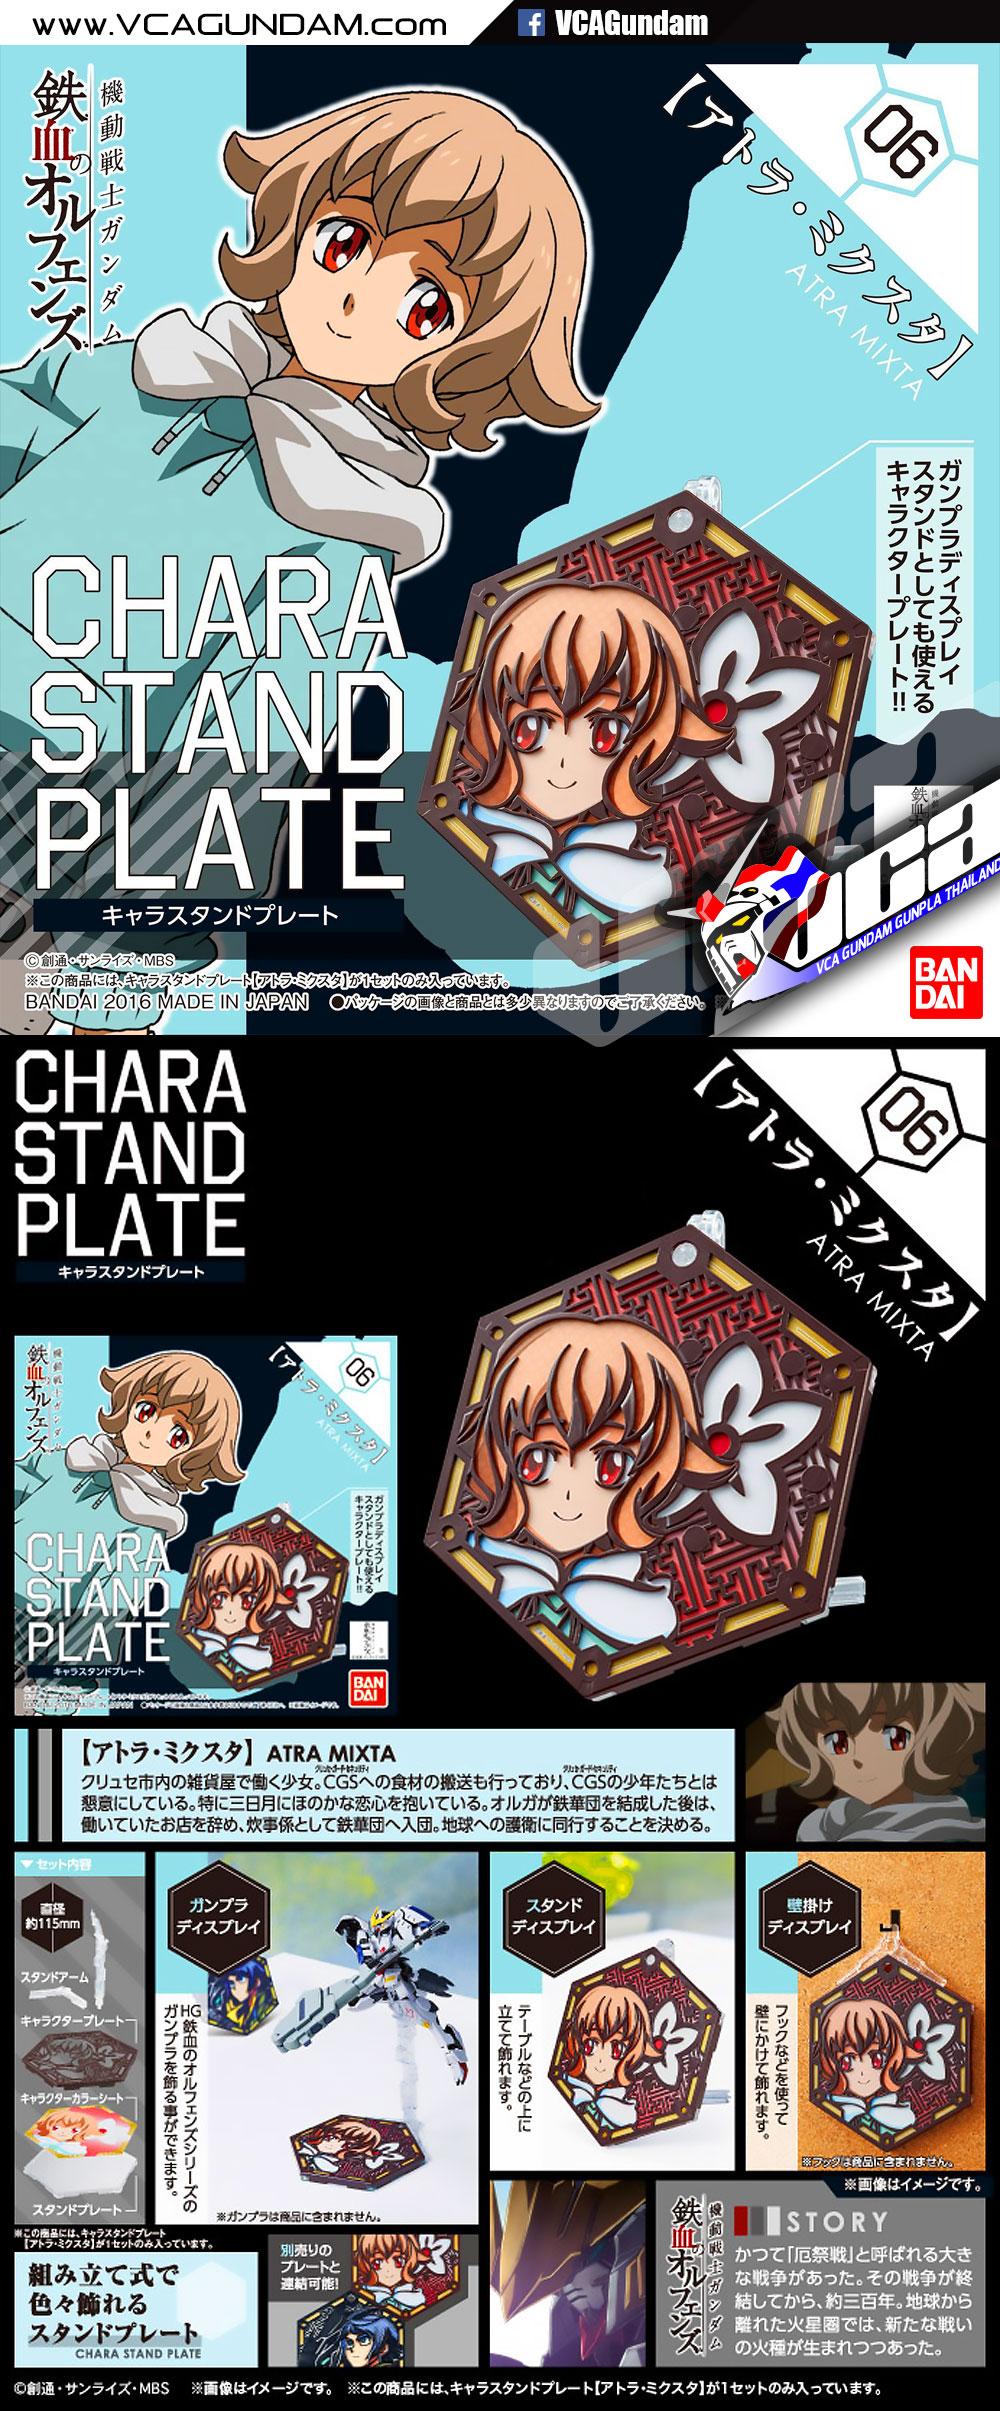 CHARA STAND PLATE ATRA MIXTA